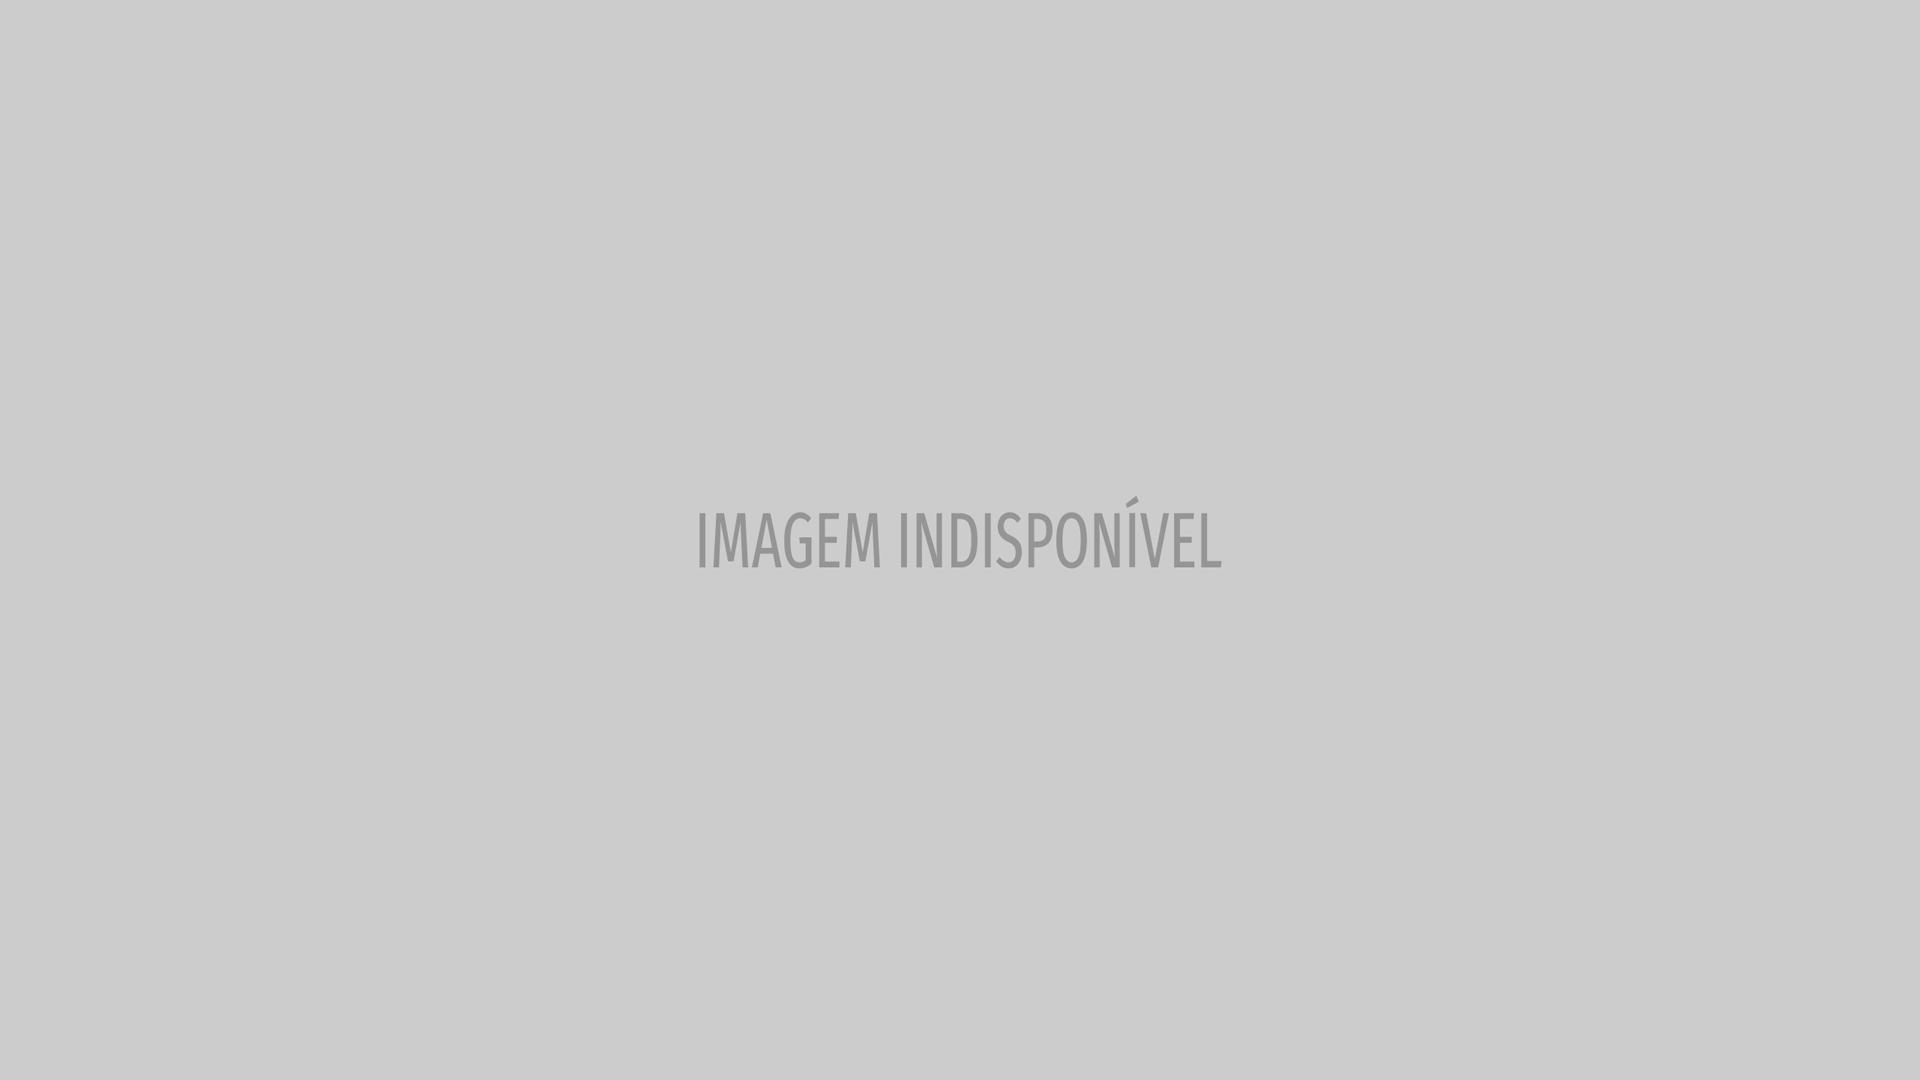 Mural de Vhils na LXFactory foi destruído